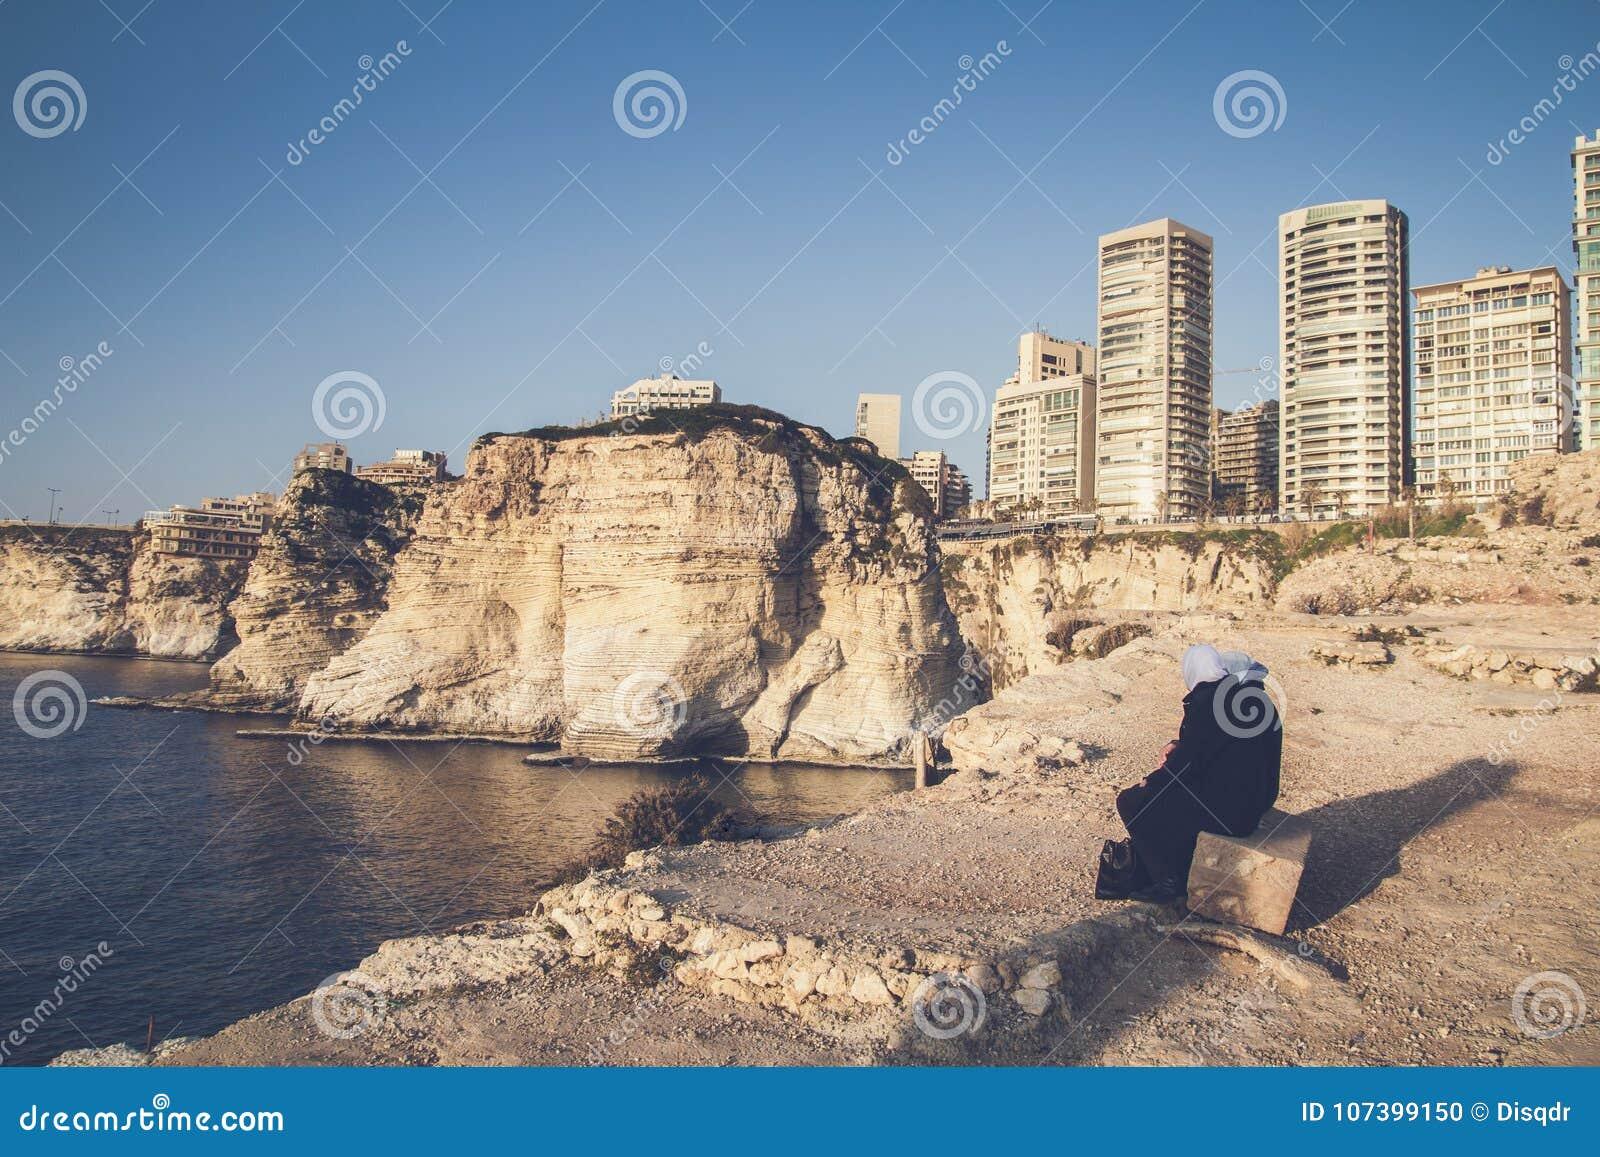 Beirut Lebanon coast and high buildings